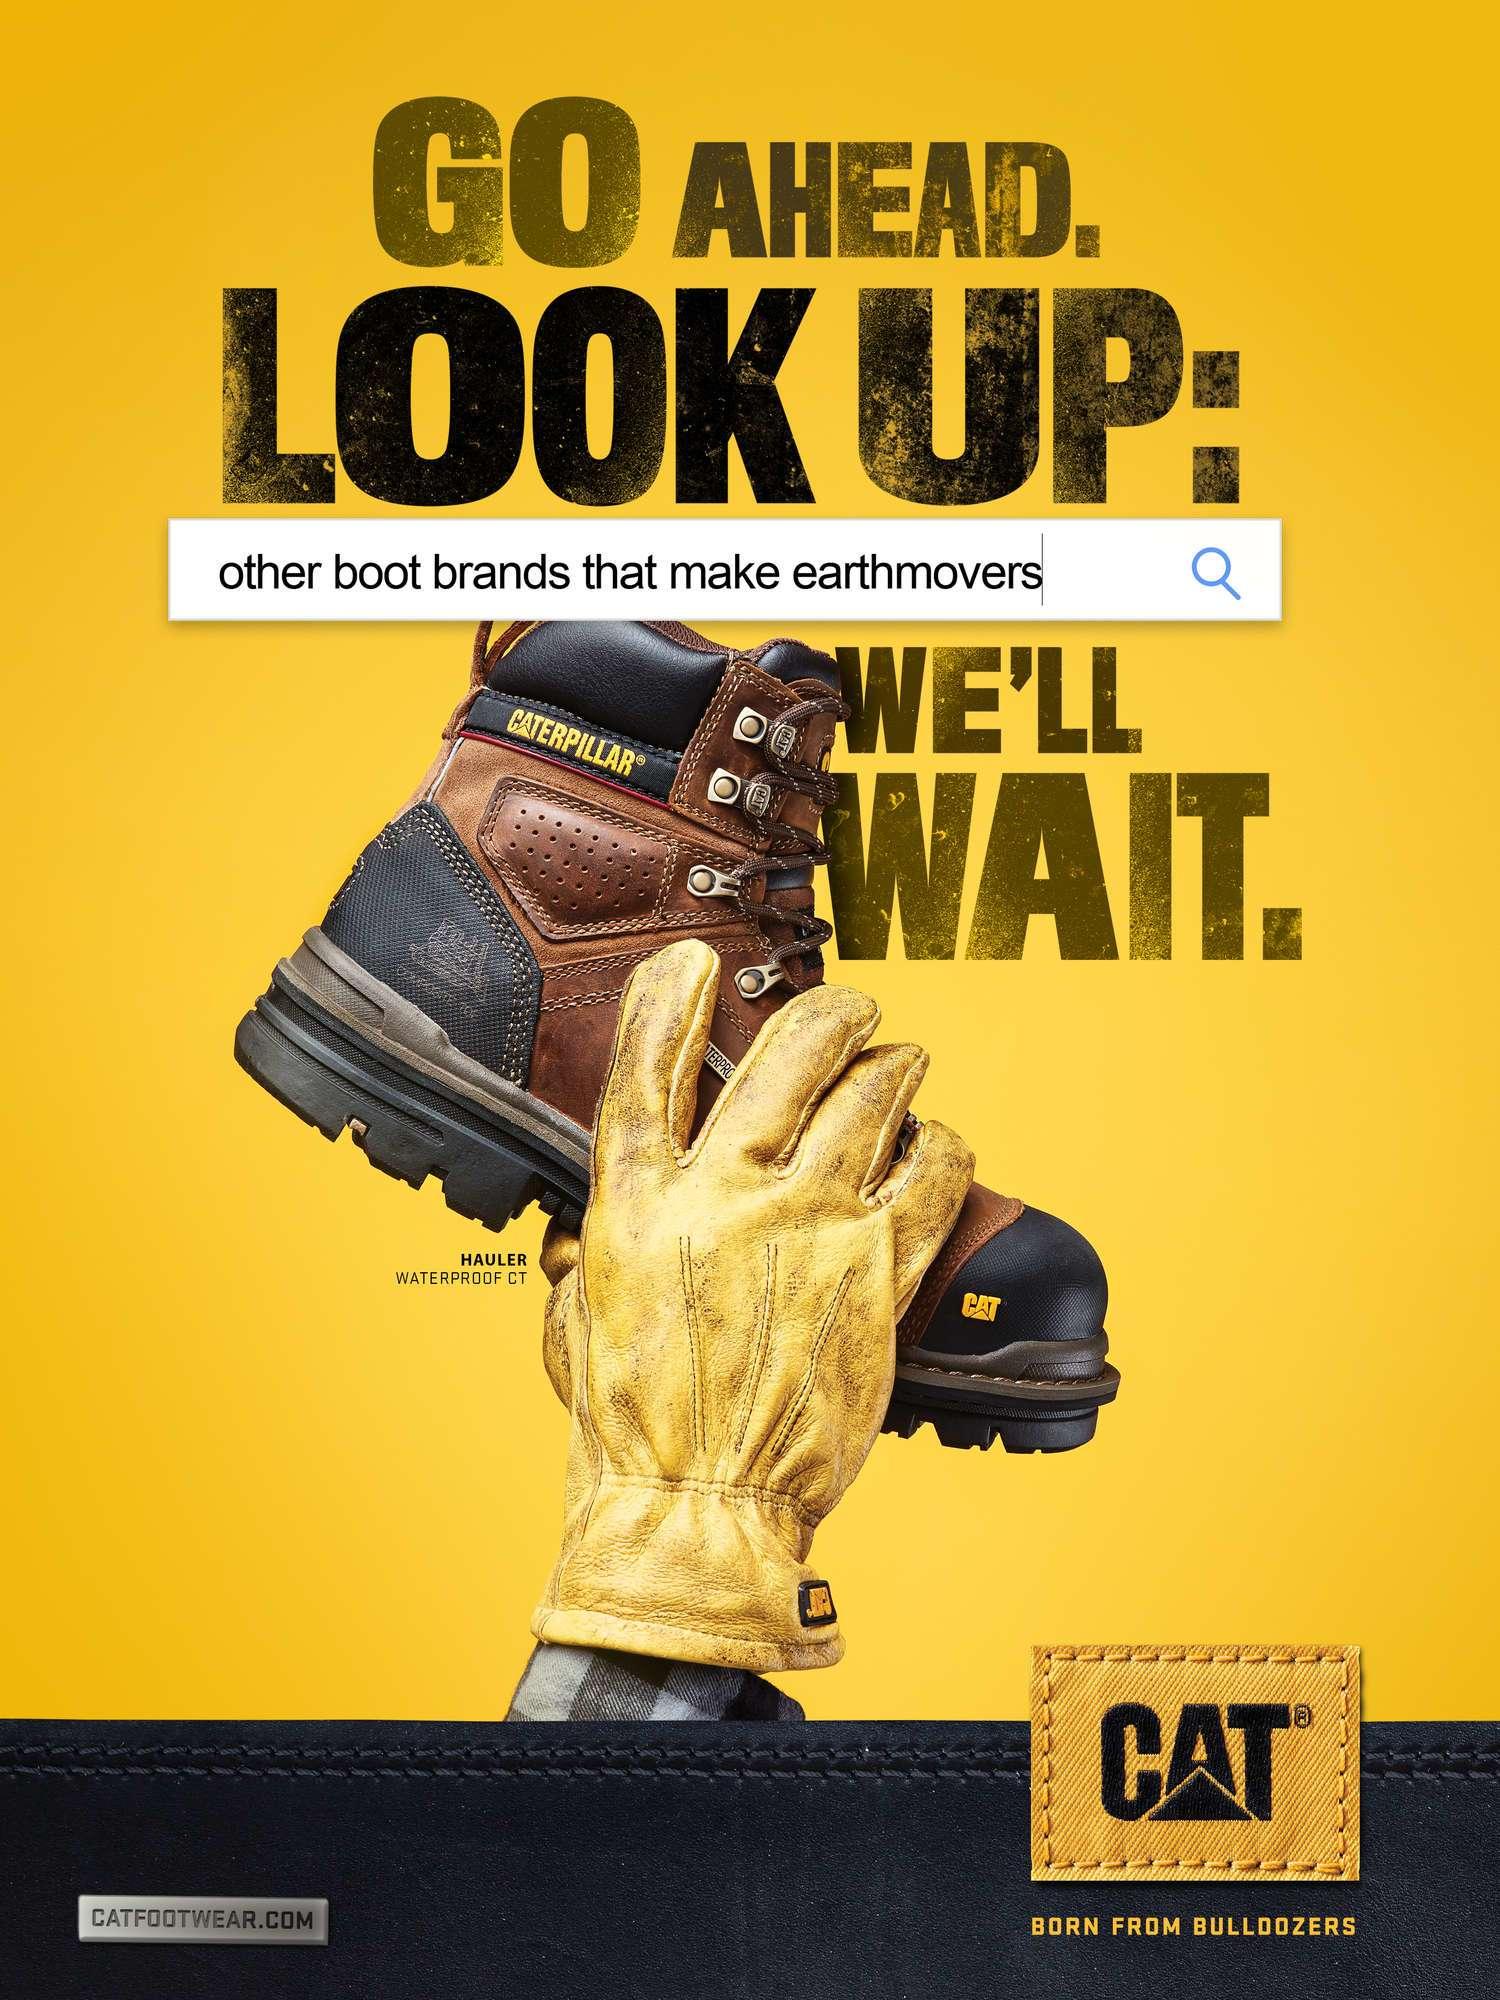 cat-go-ahead-look-up.jpg